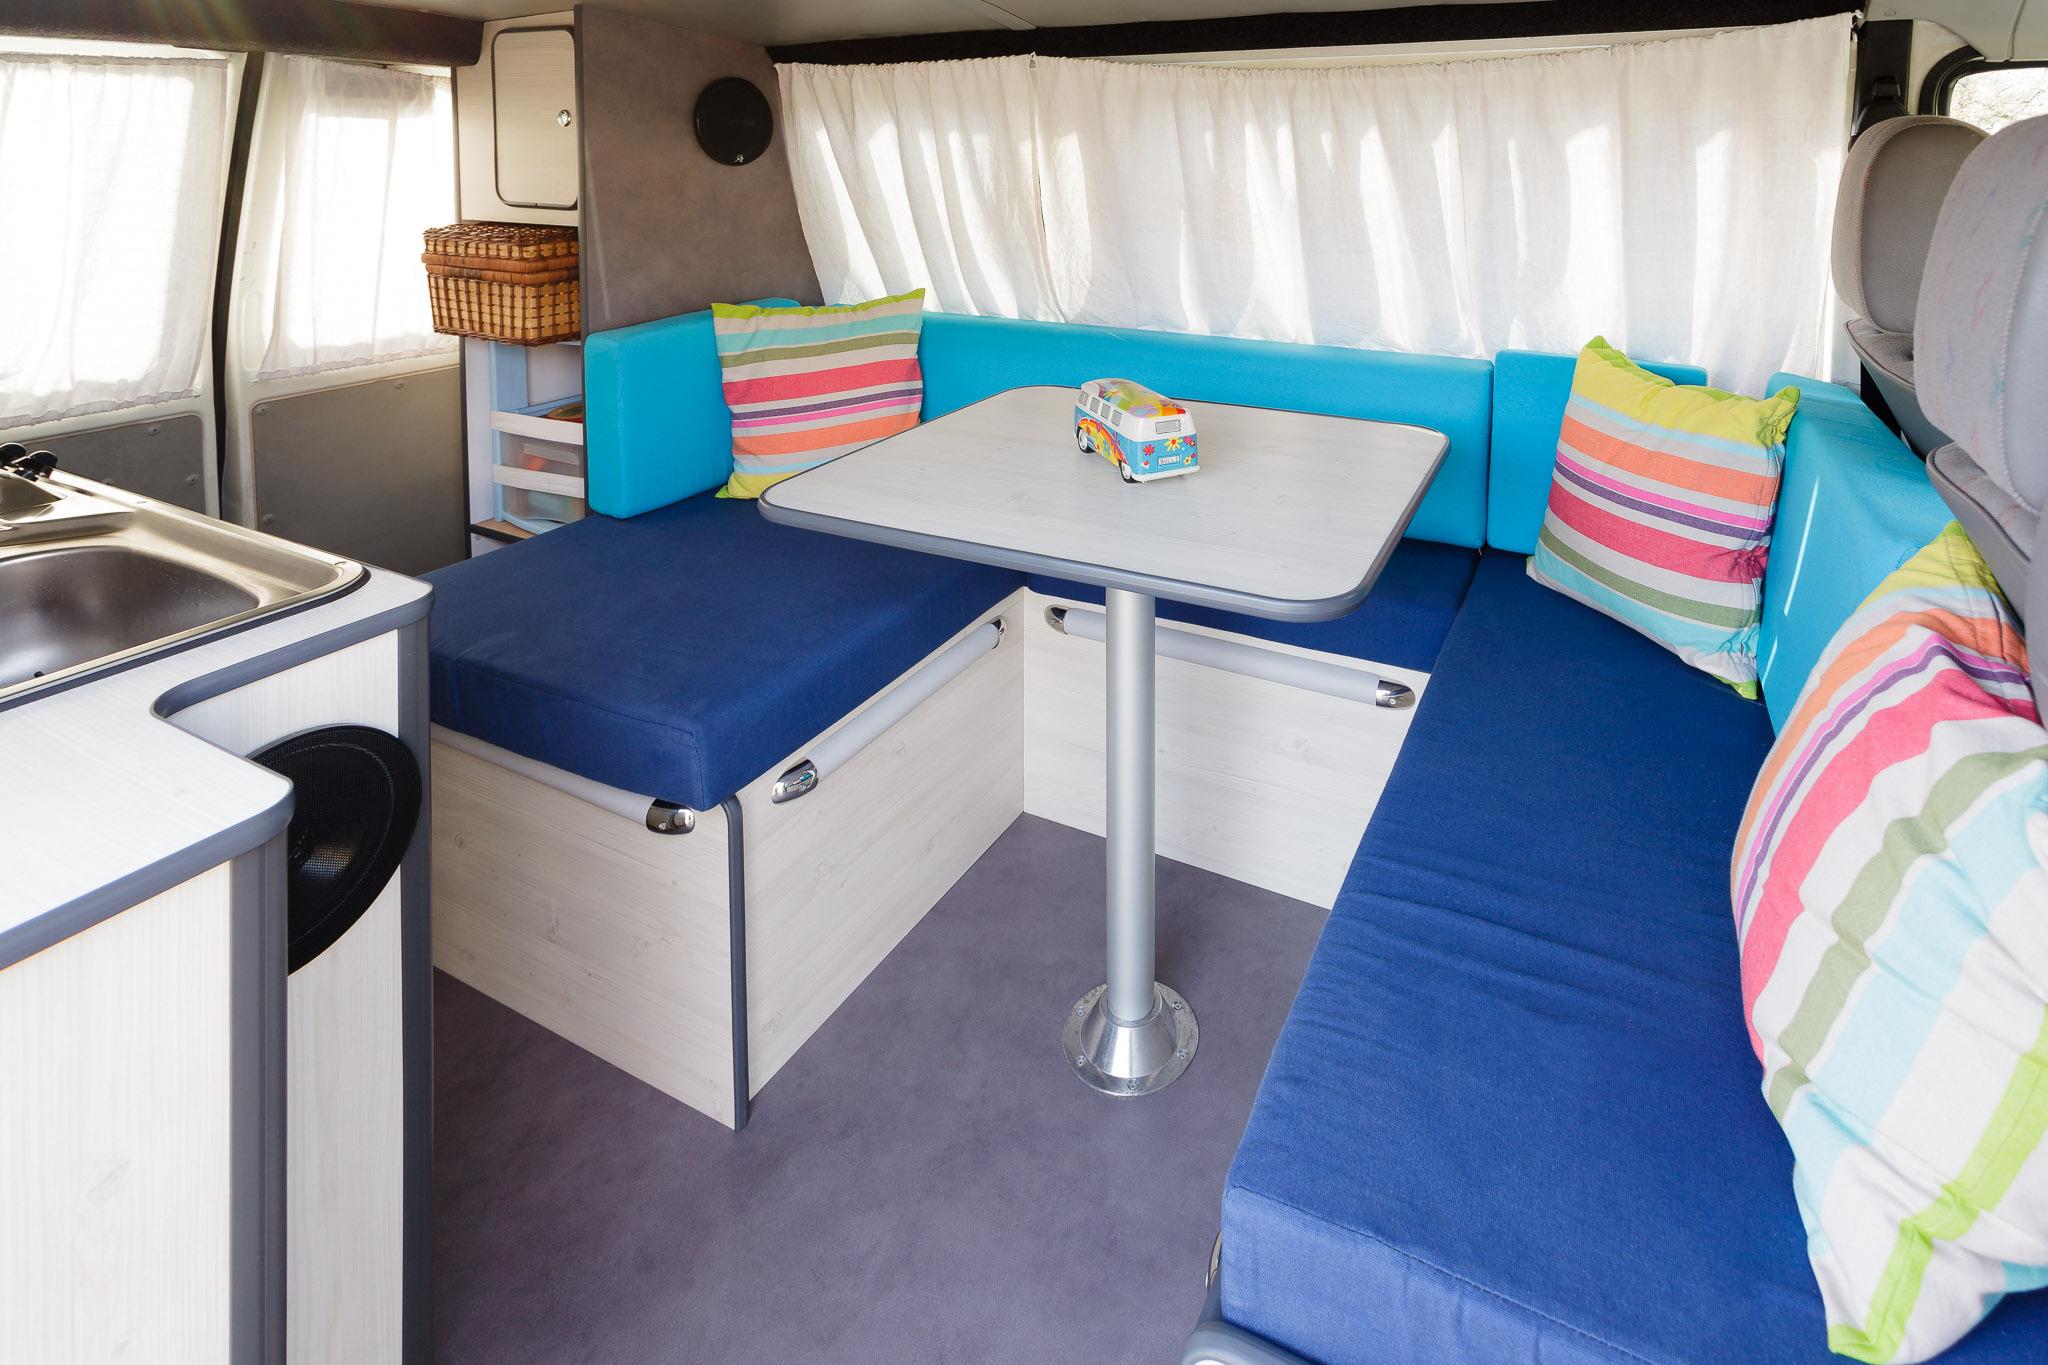 De camping camping car achat vente mobilier de camping camping - Jp Kit Amenagement Convivialite Bleu Bois B